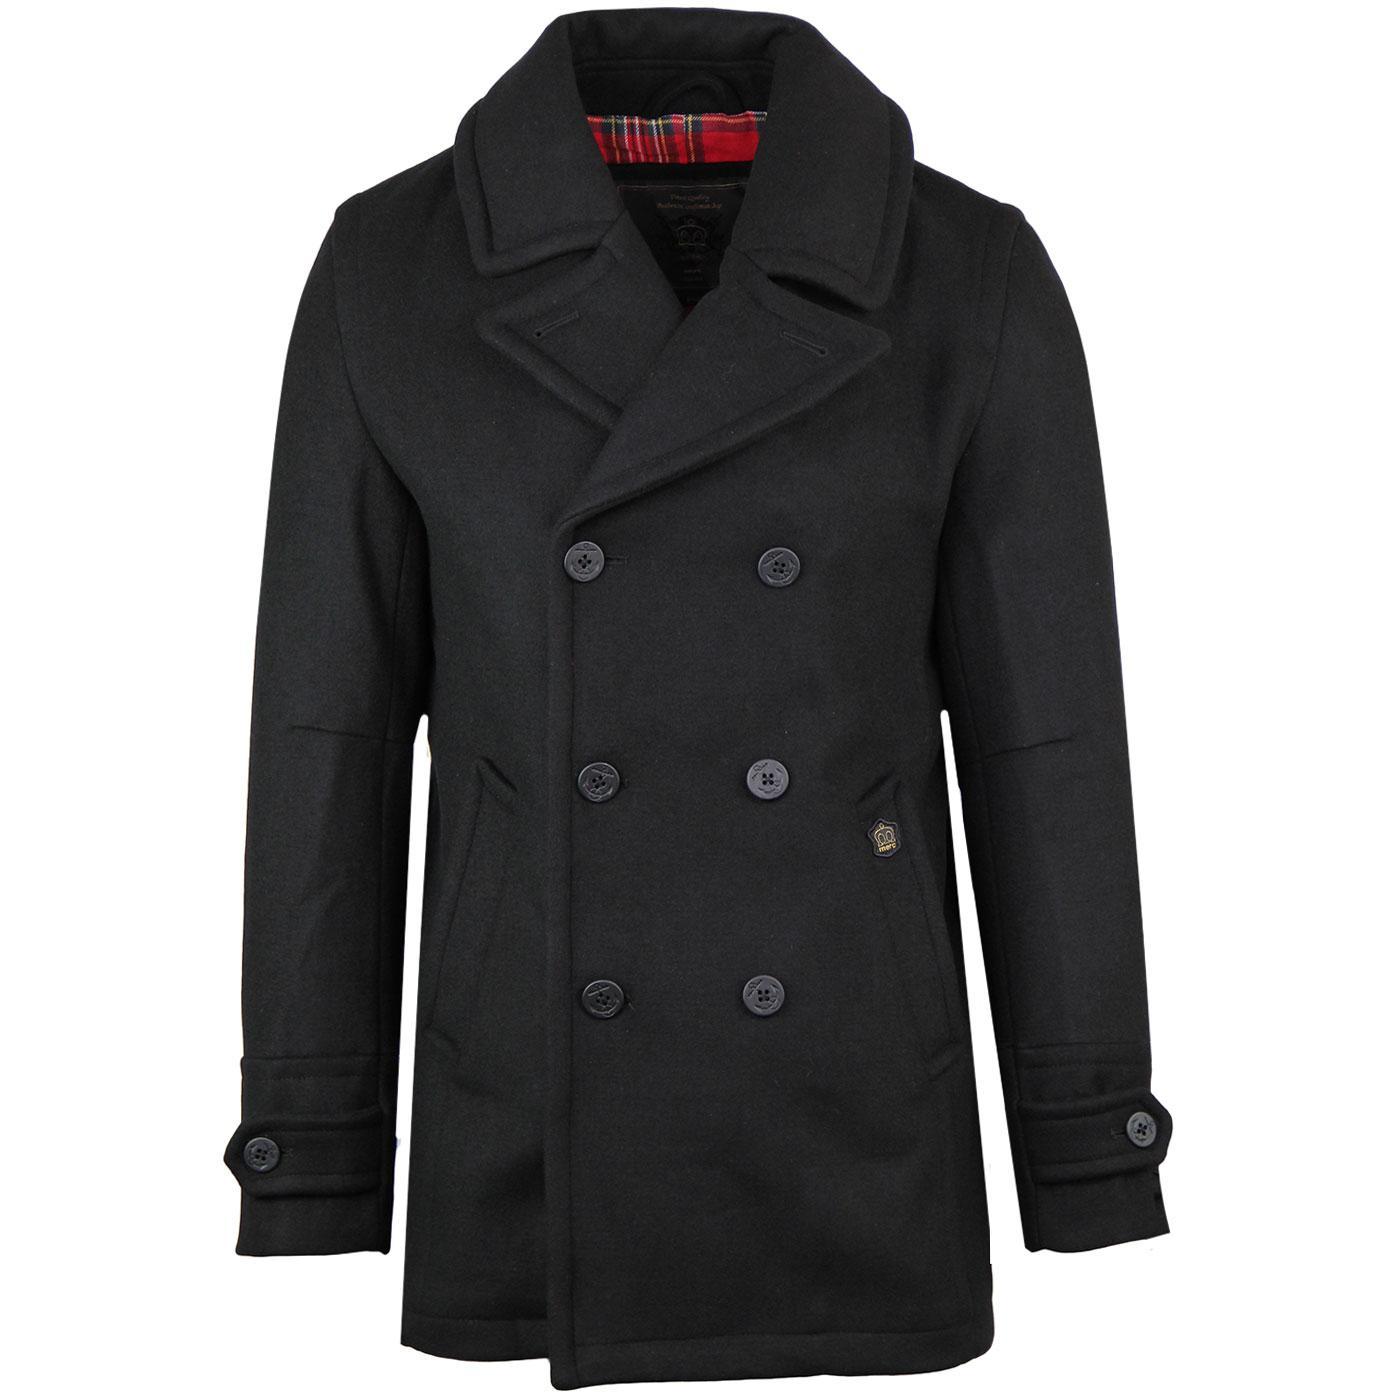 Doyle MERC Mod Tartan Lined Melton Pea Coat BLACK